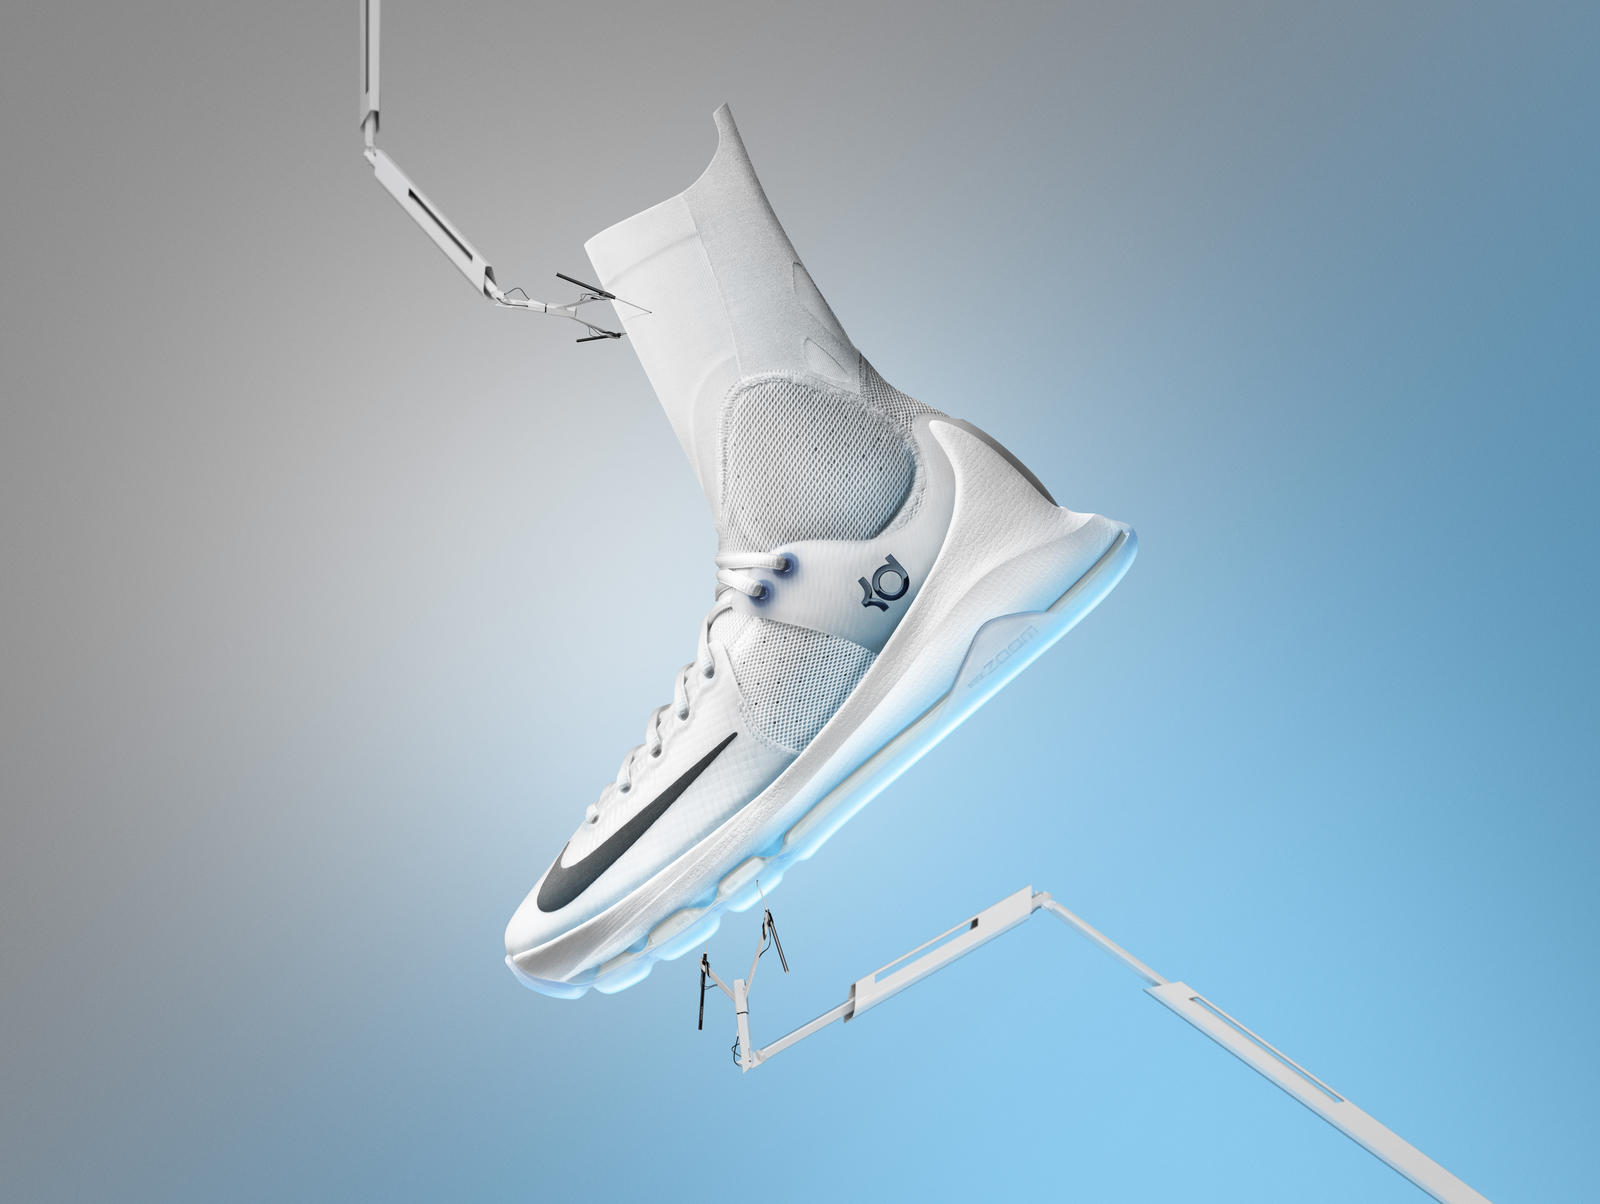 finest selection d27e7 fbea2 Nike Unveils the KD 8 Elite Series